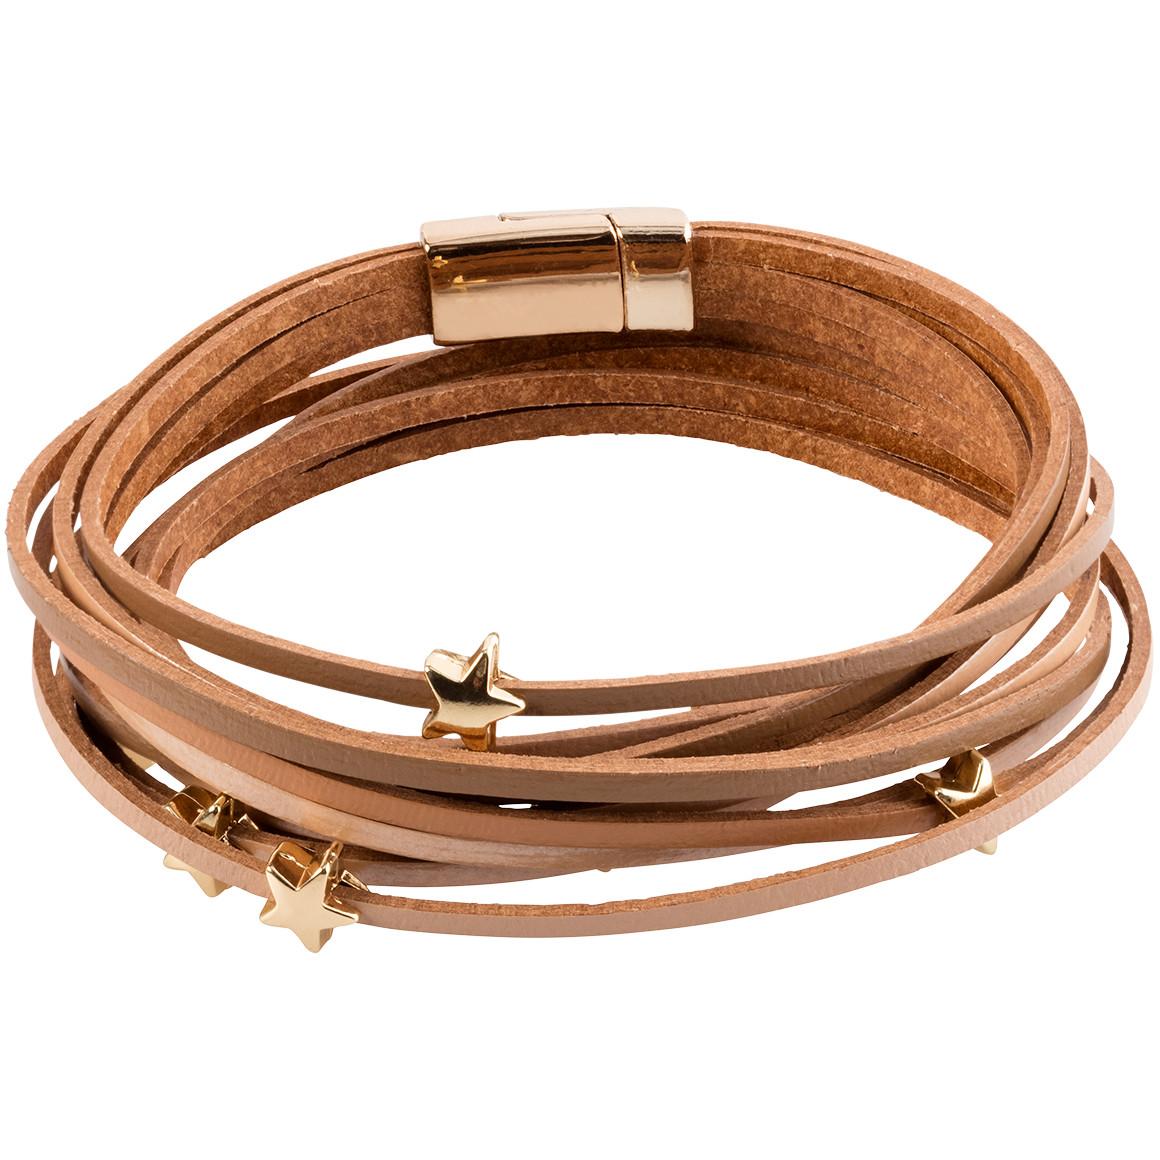 Damen Armband aus Leder - broschei